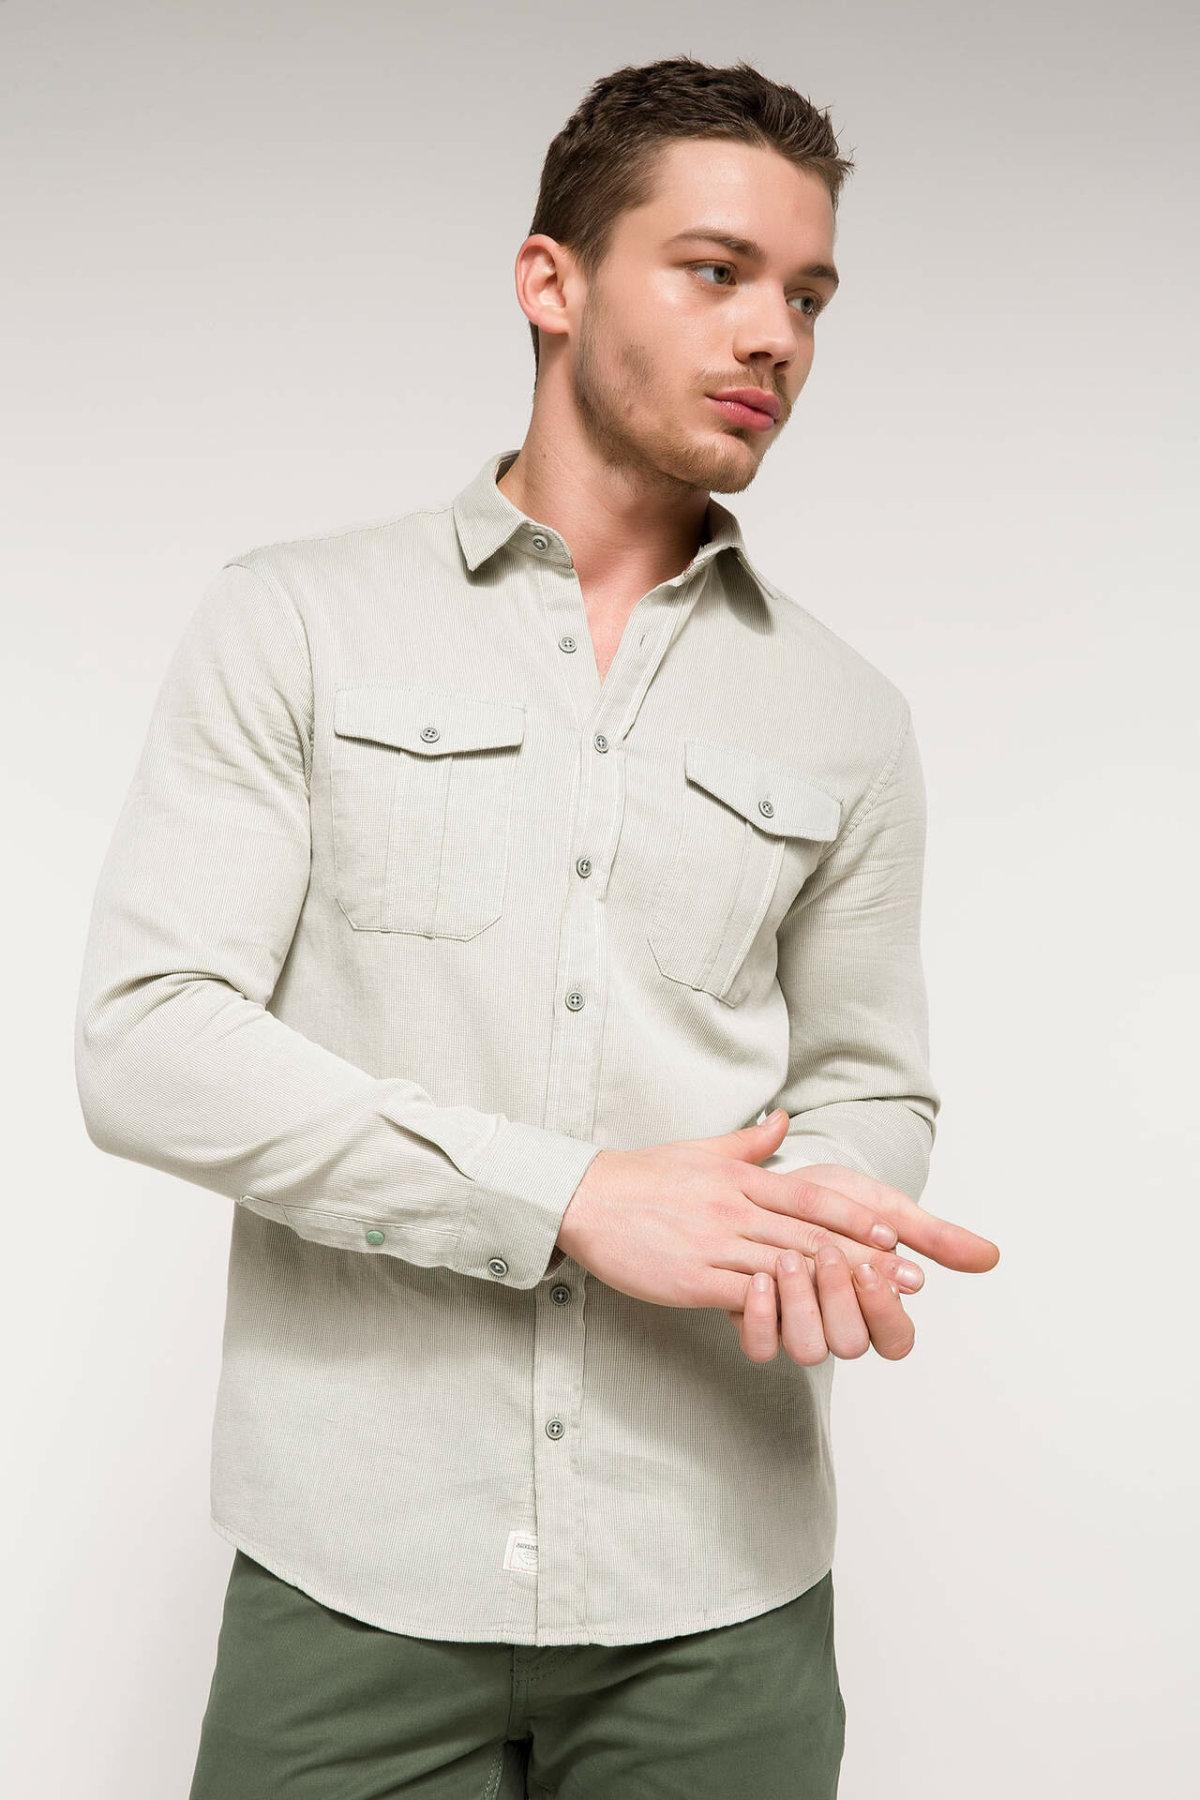 DeFacto Casual Man Long Sleeve Shirt Male Fashion Pockets Shirts High Quality Simple Tops Spring  - I6399AZ18SM